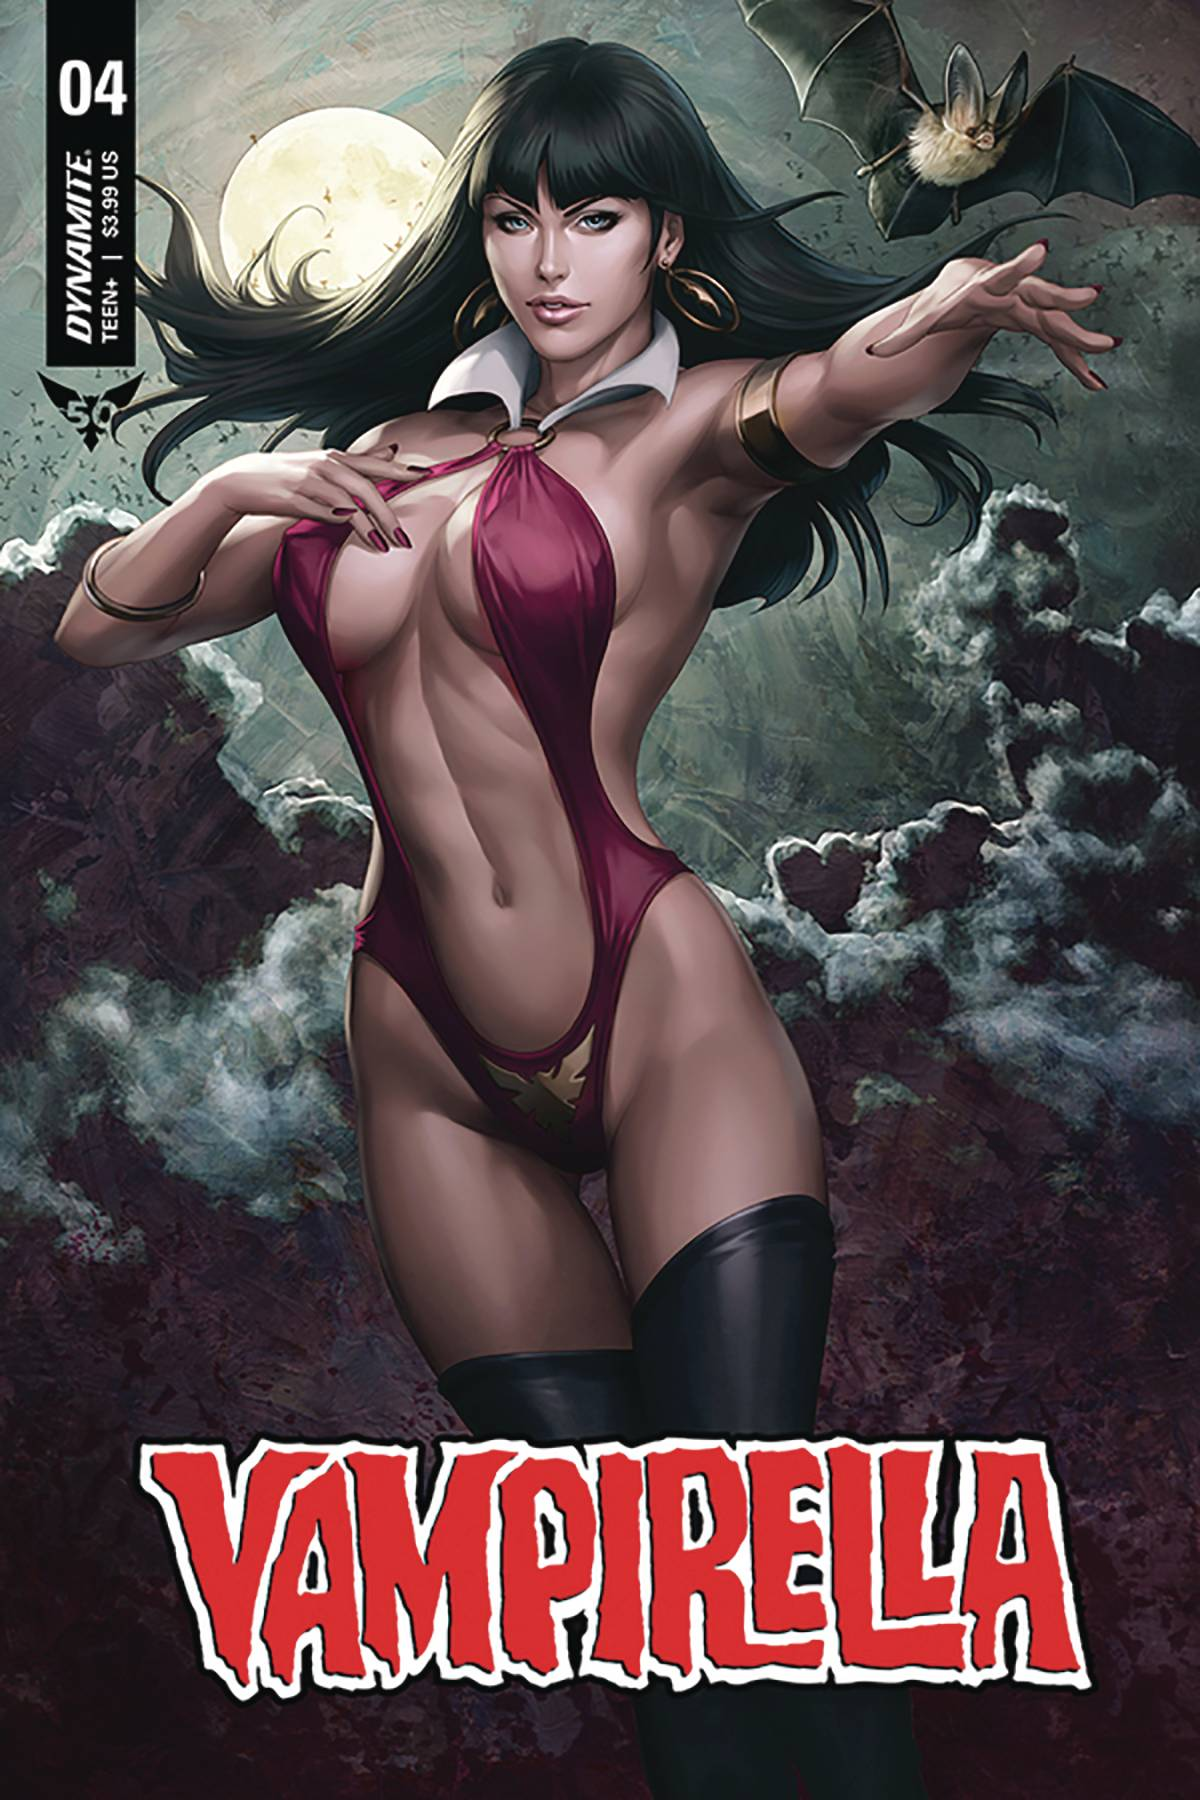 Vampirella #4 (2019)